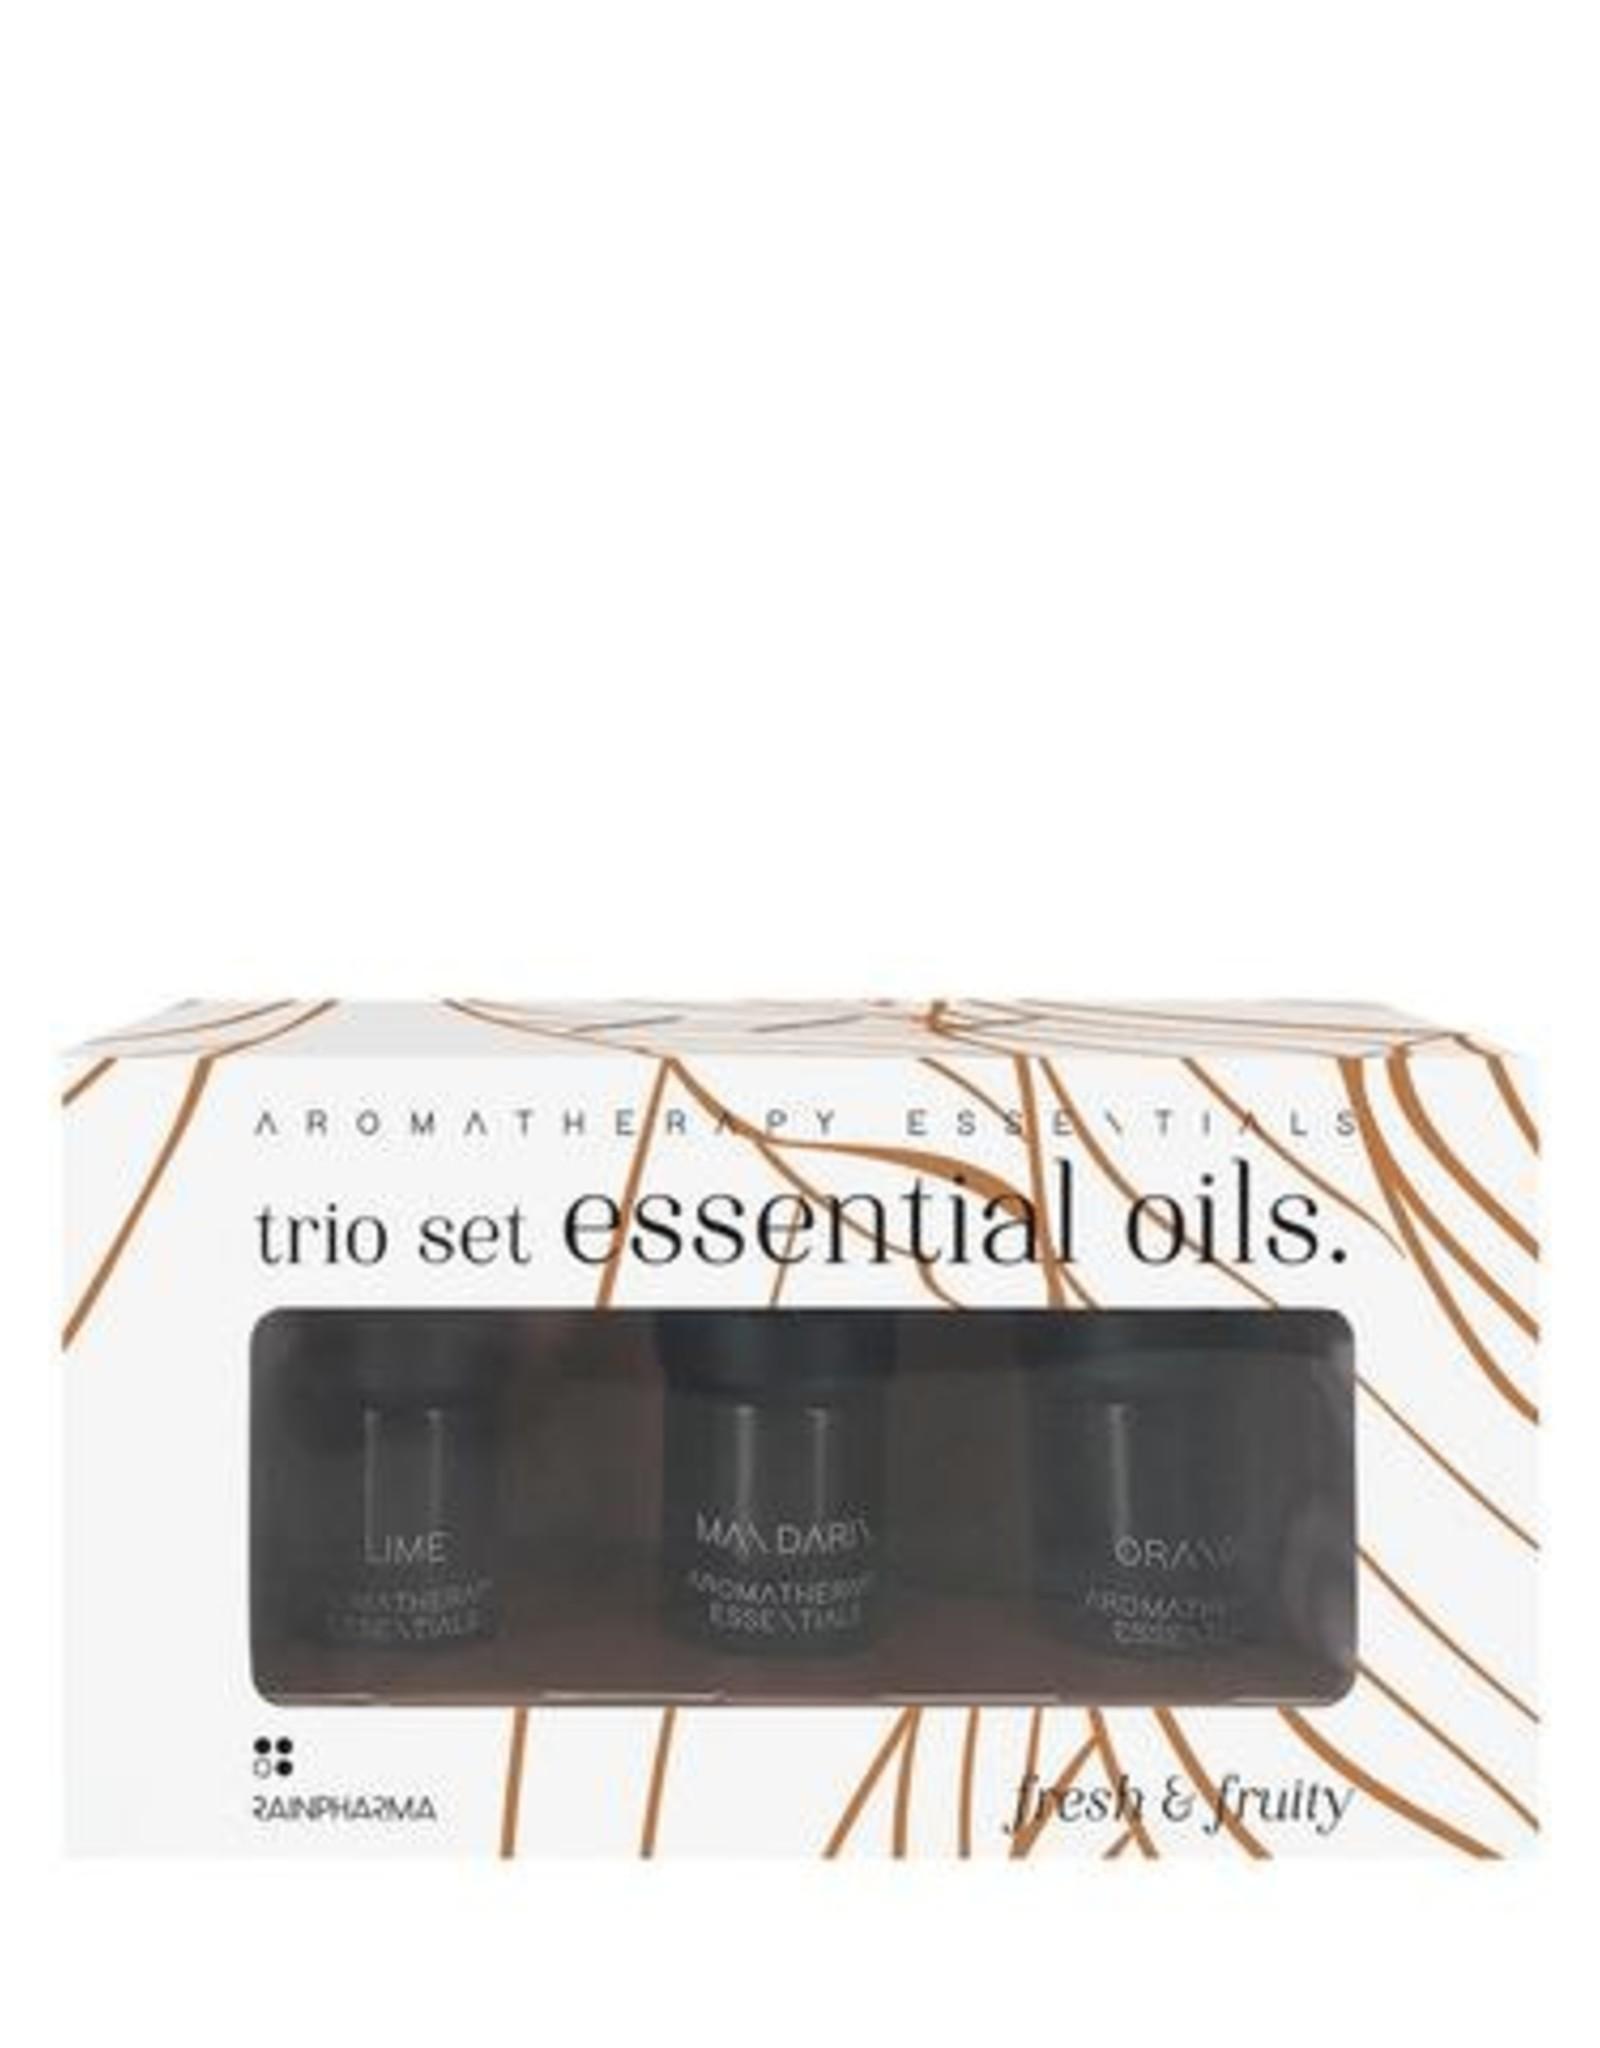 RainPharma Trio Essential Oils - Fresh & Fruity - Rainpharma